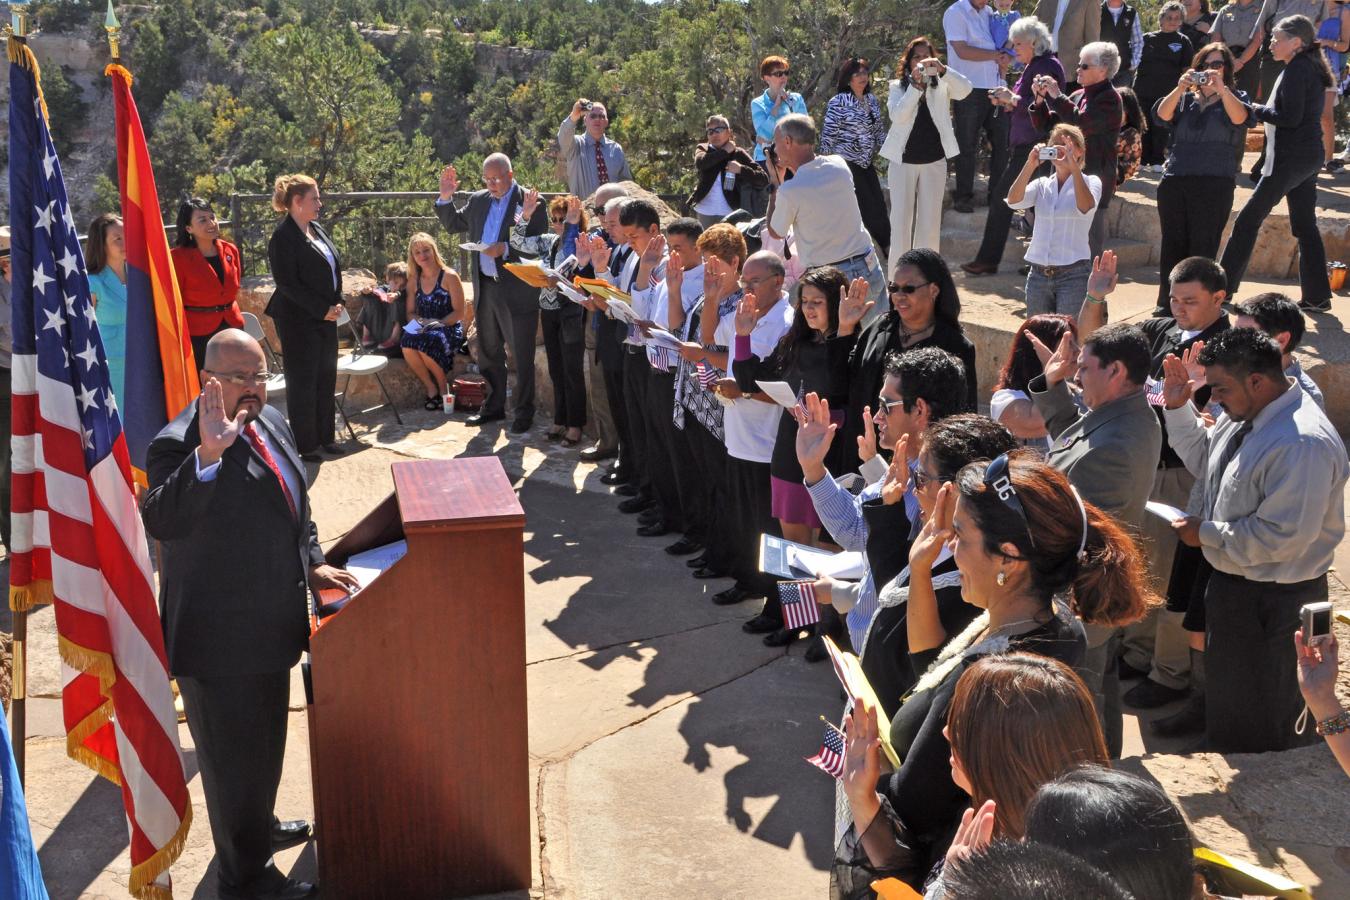 Grand Canyon naturalization ceremony 30 June 2017